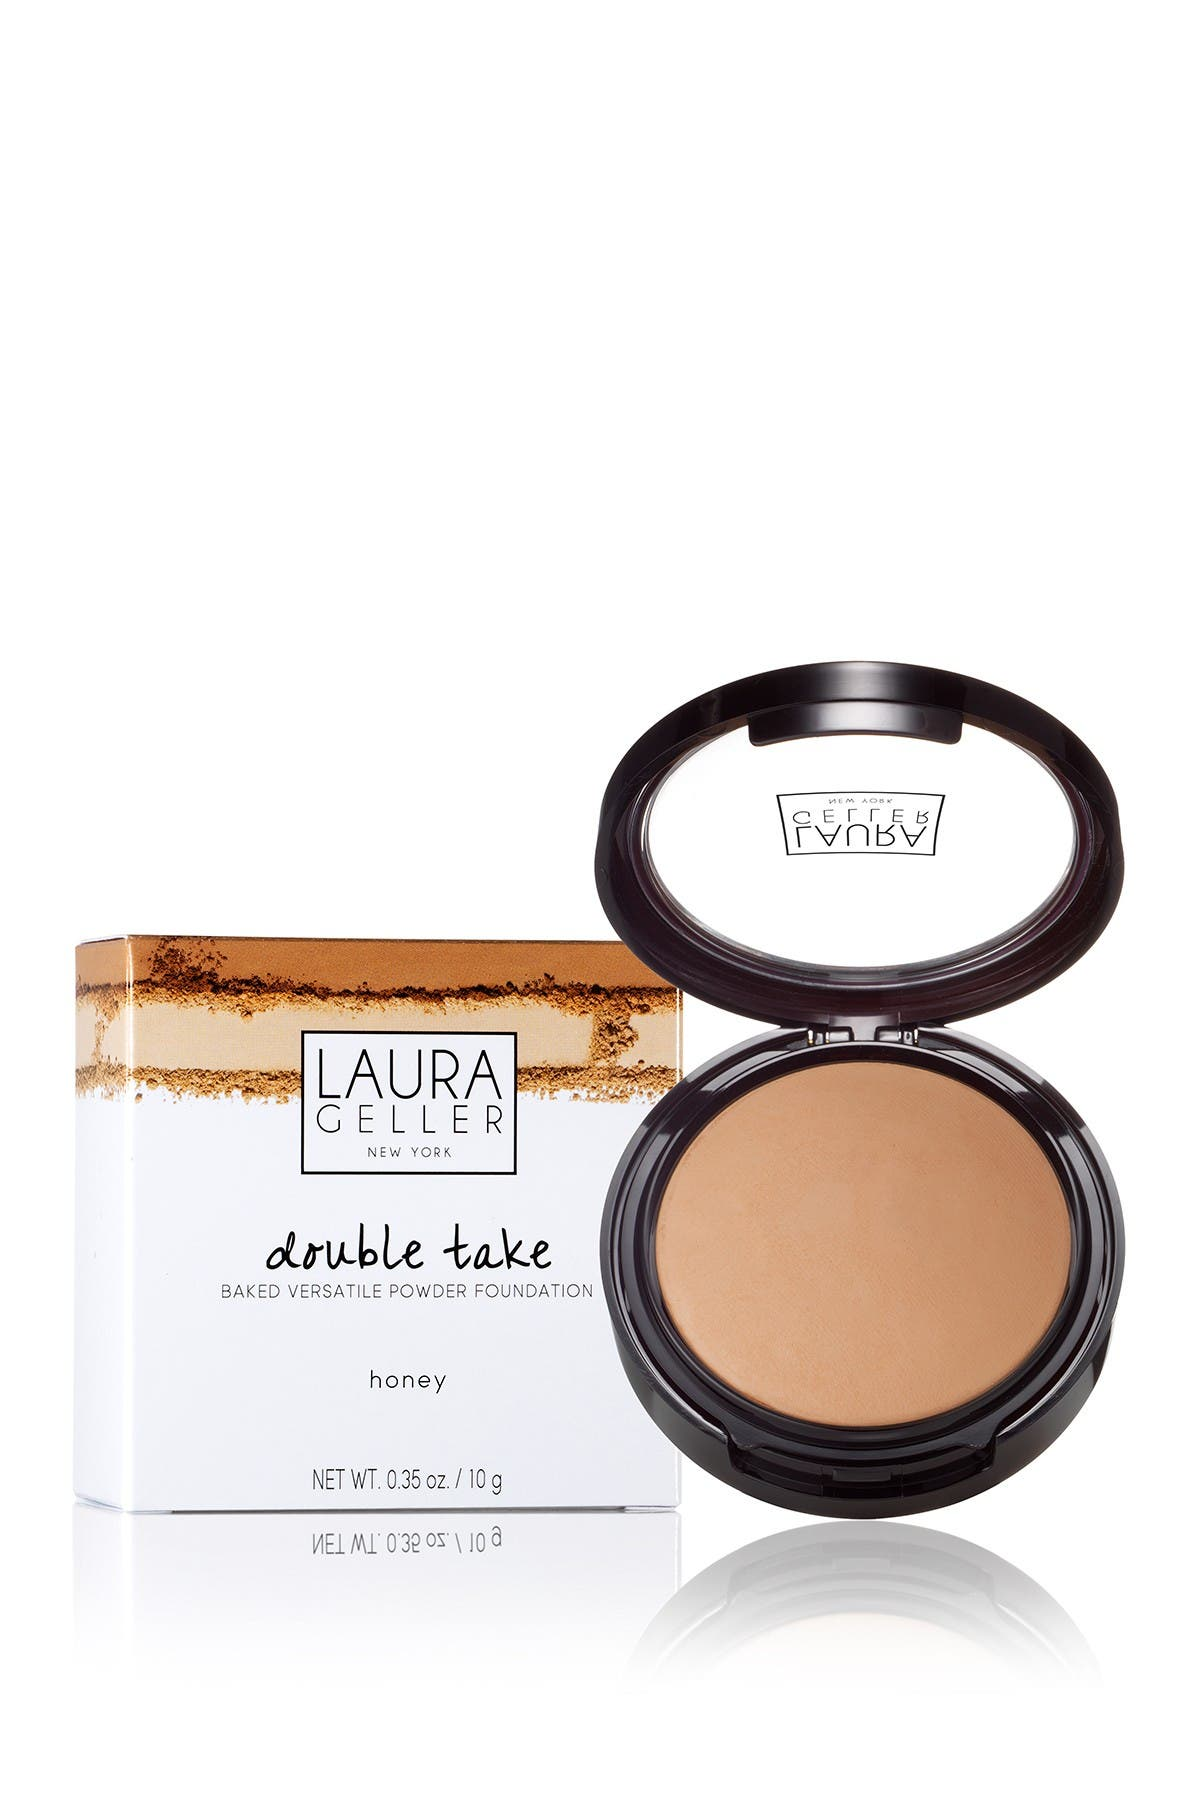 Image of Laura Geller New York Double Take Baked Versatile Powder Foundation - Honey